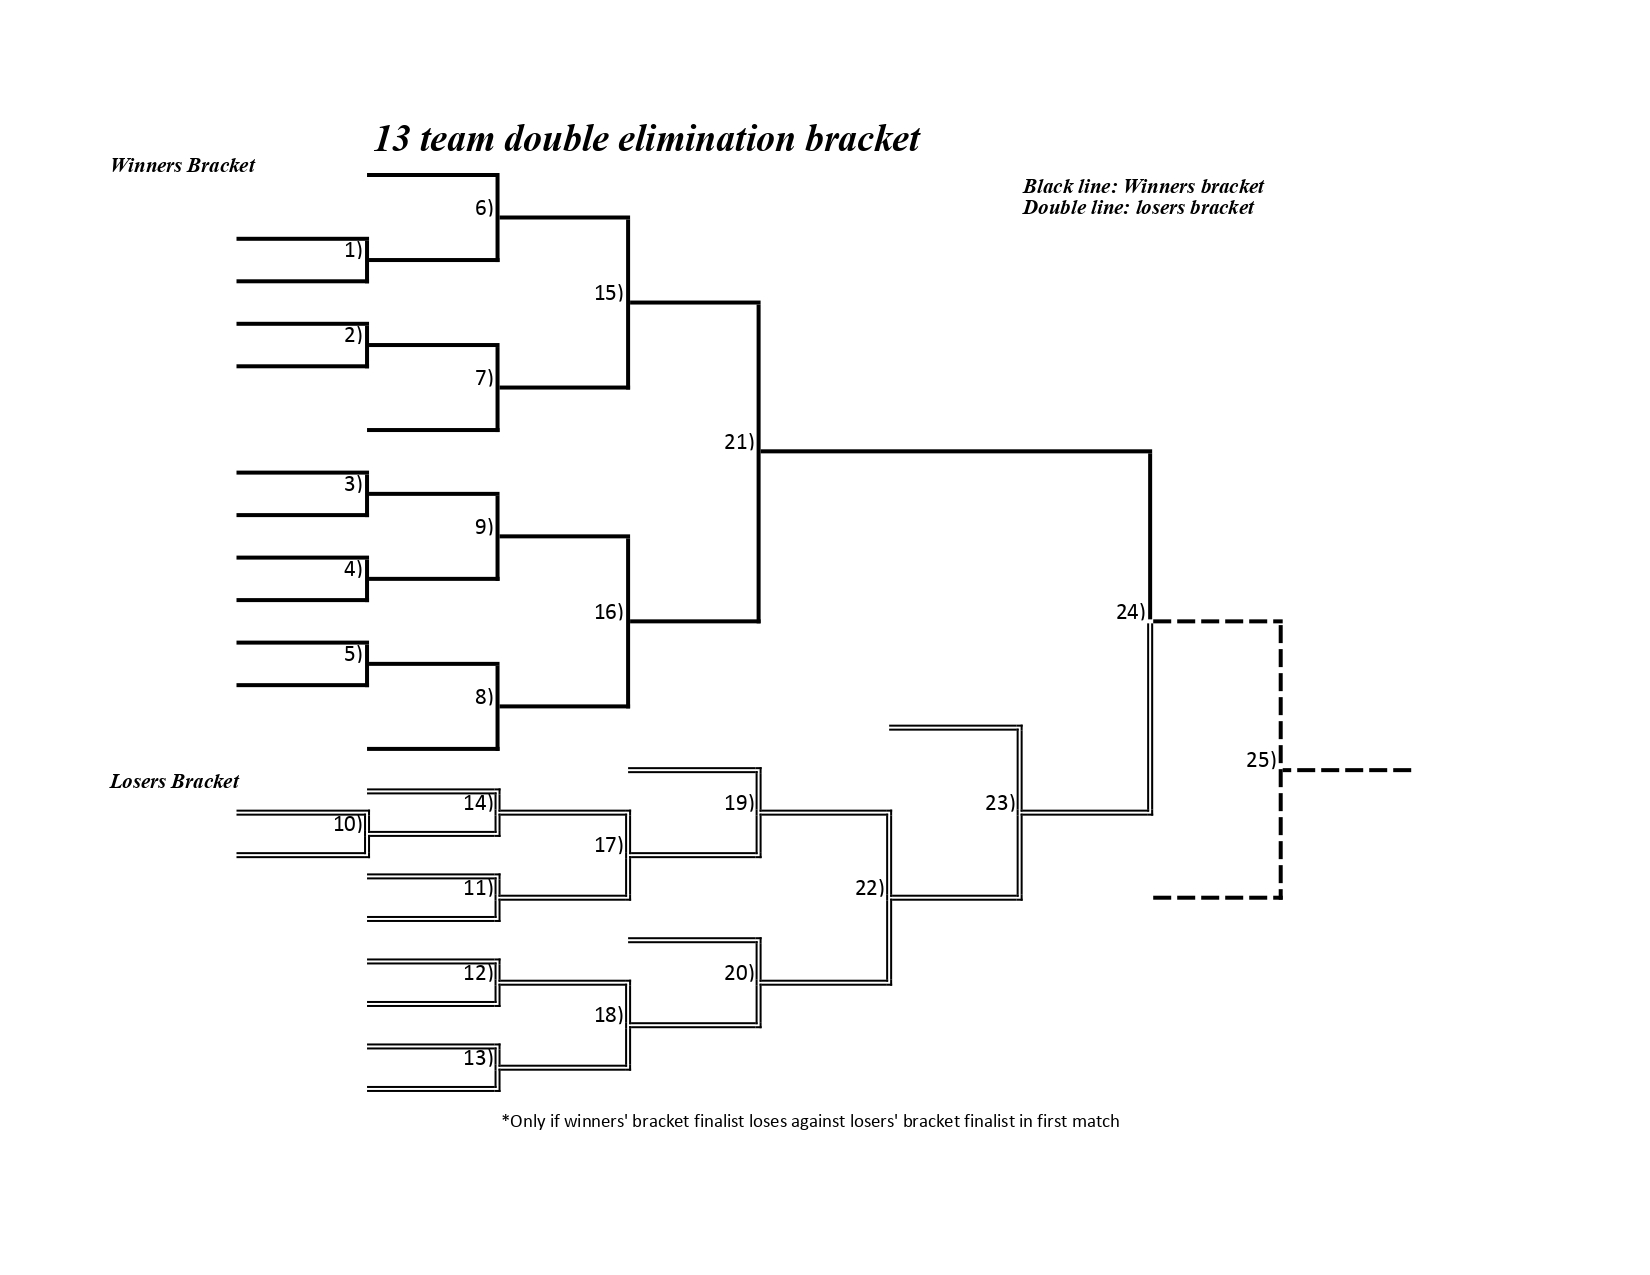 Free printable 13 team double elimination bracket